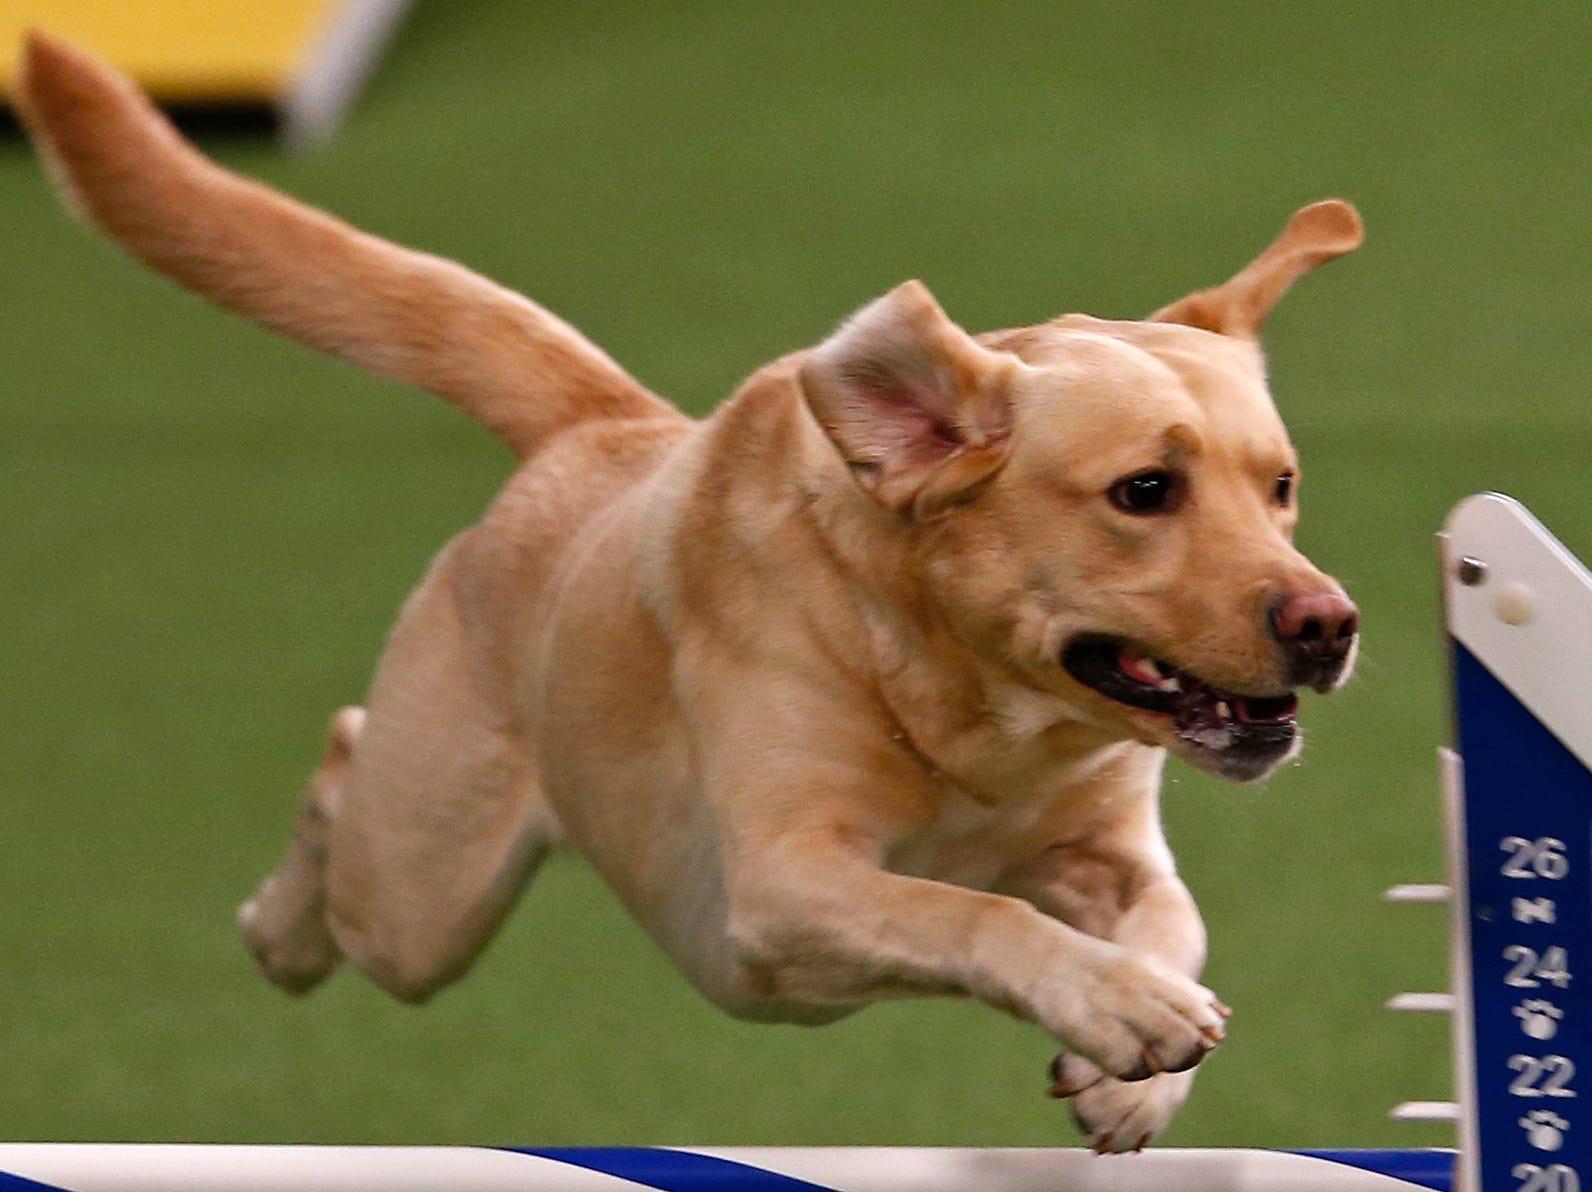 Tag, a Labrador Retriever, is seen during masters agility preliminaries.